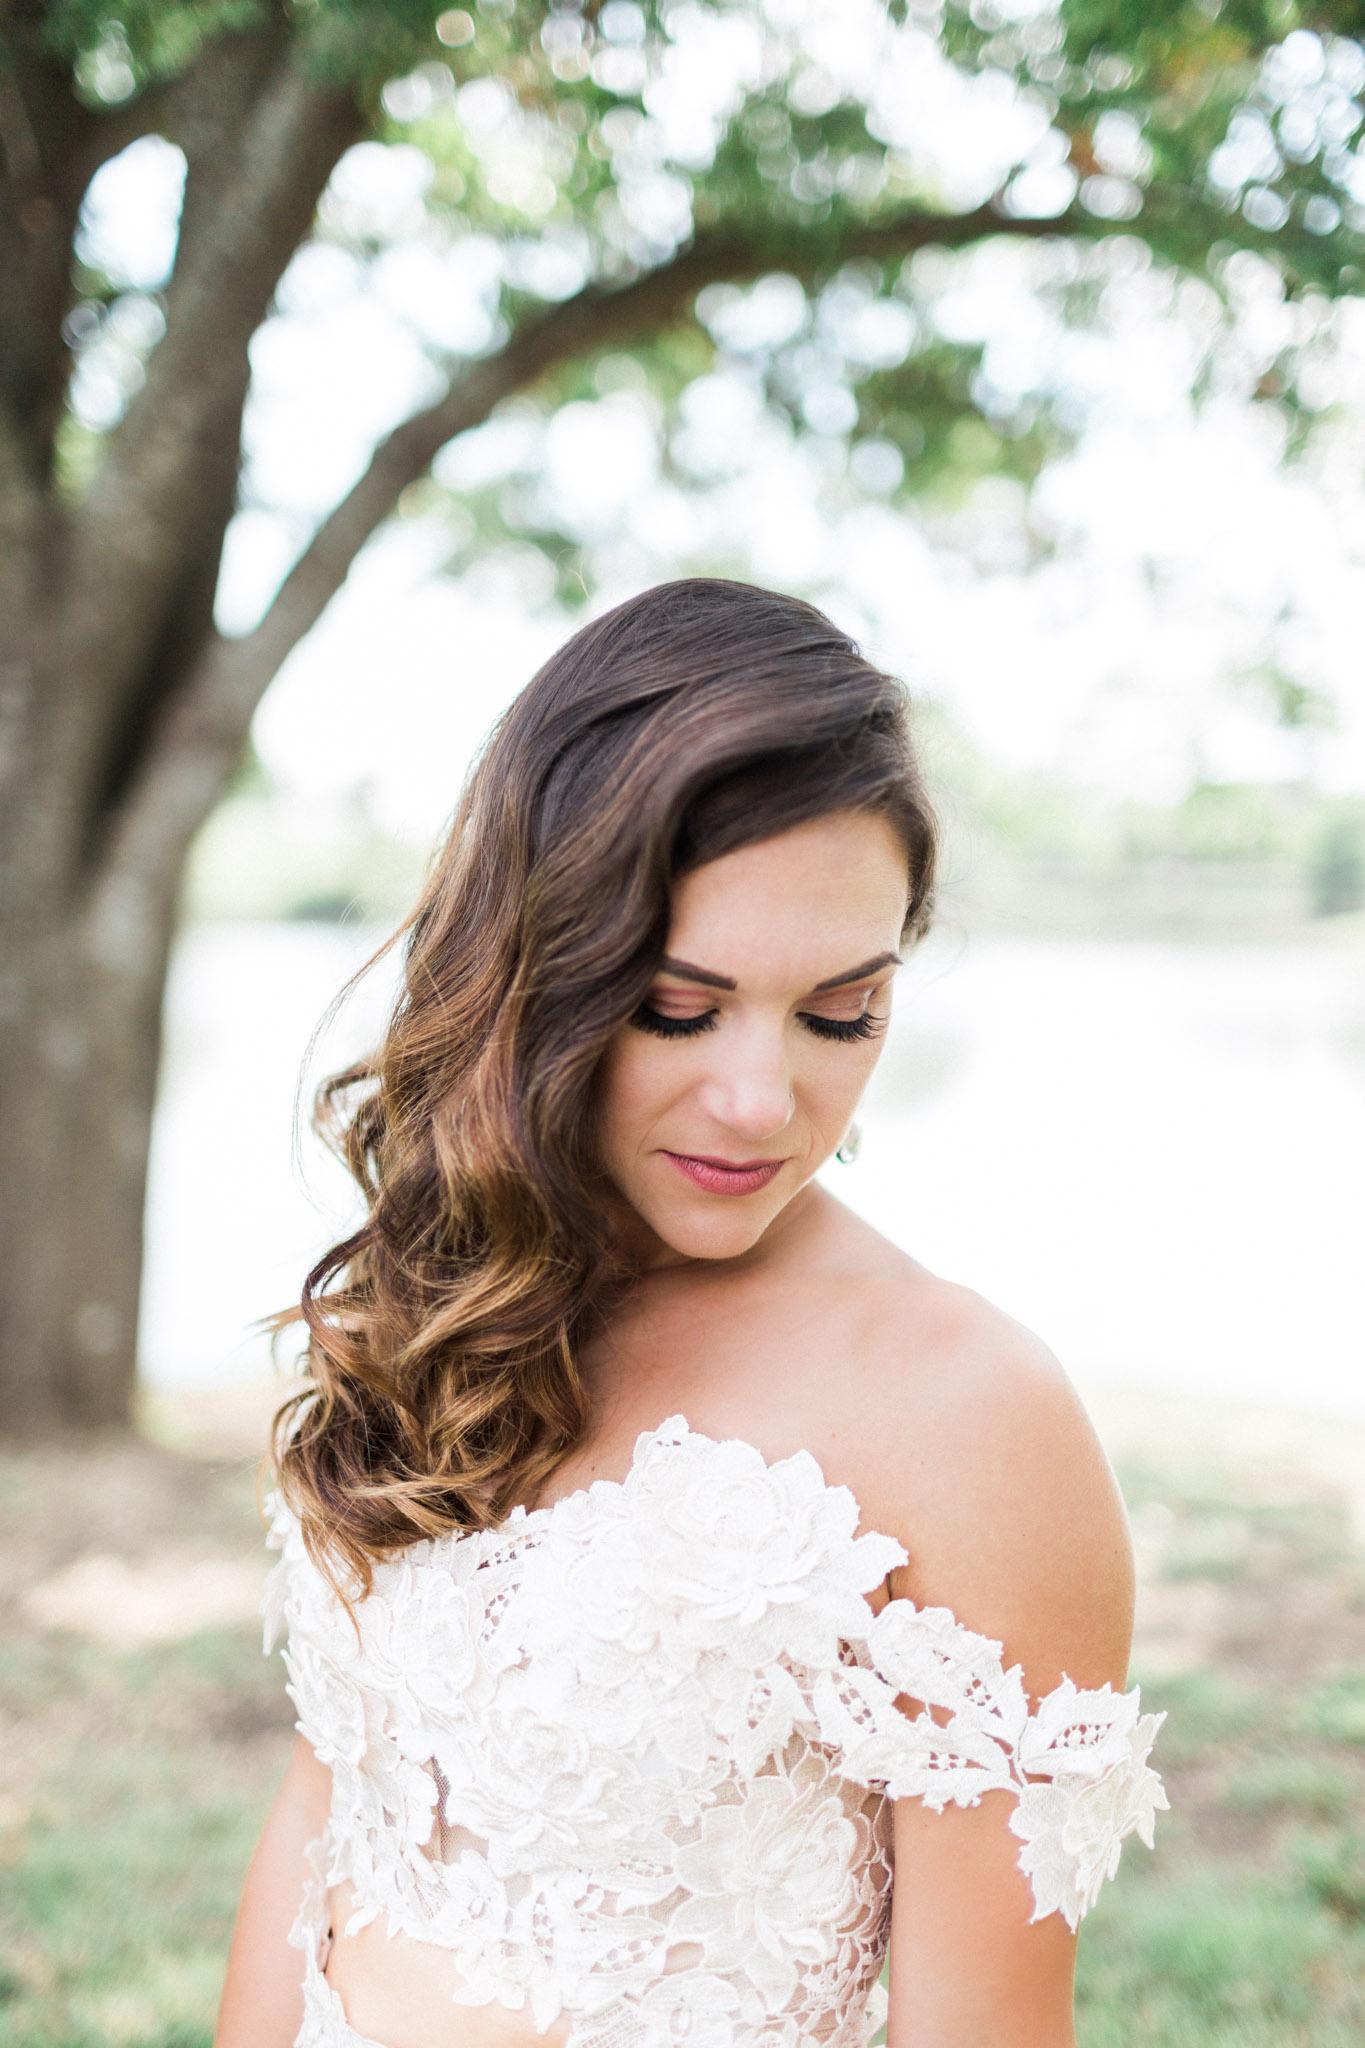 TheBigFakeWedding_DFW_wedding_photographer-23.jpg